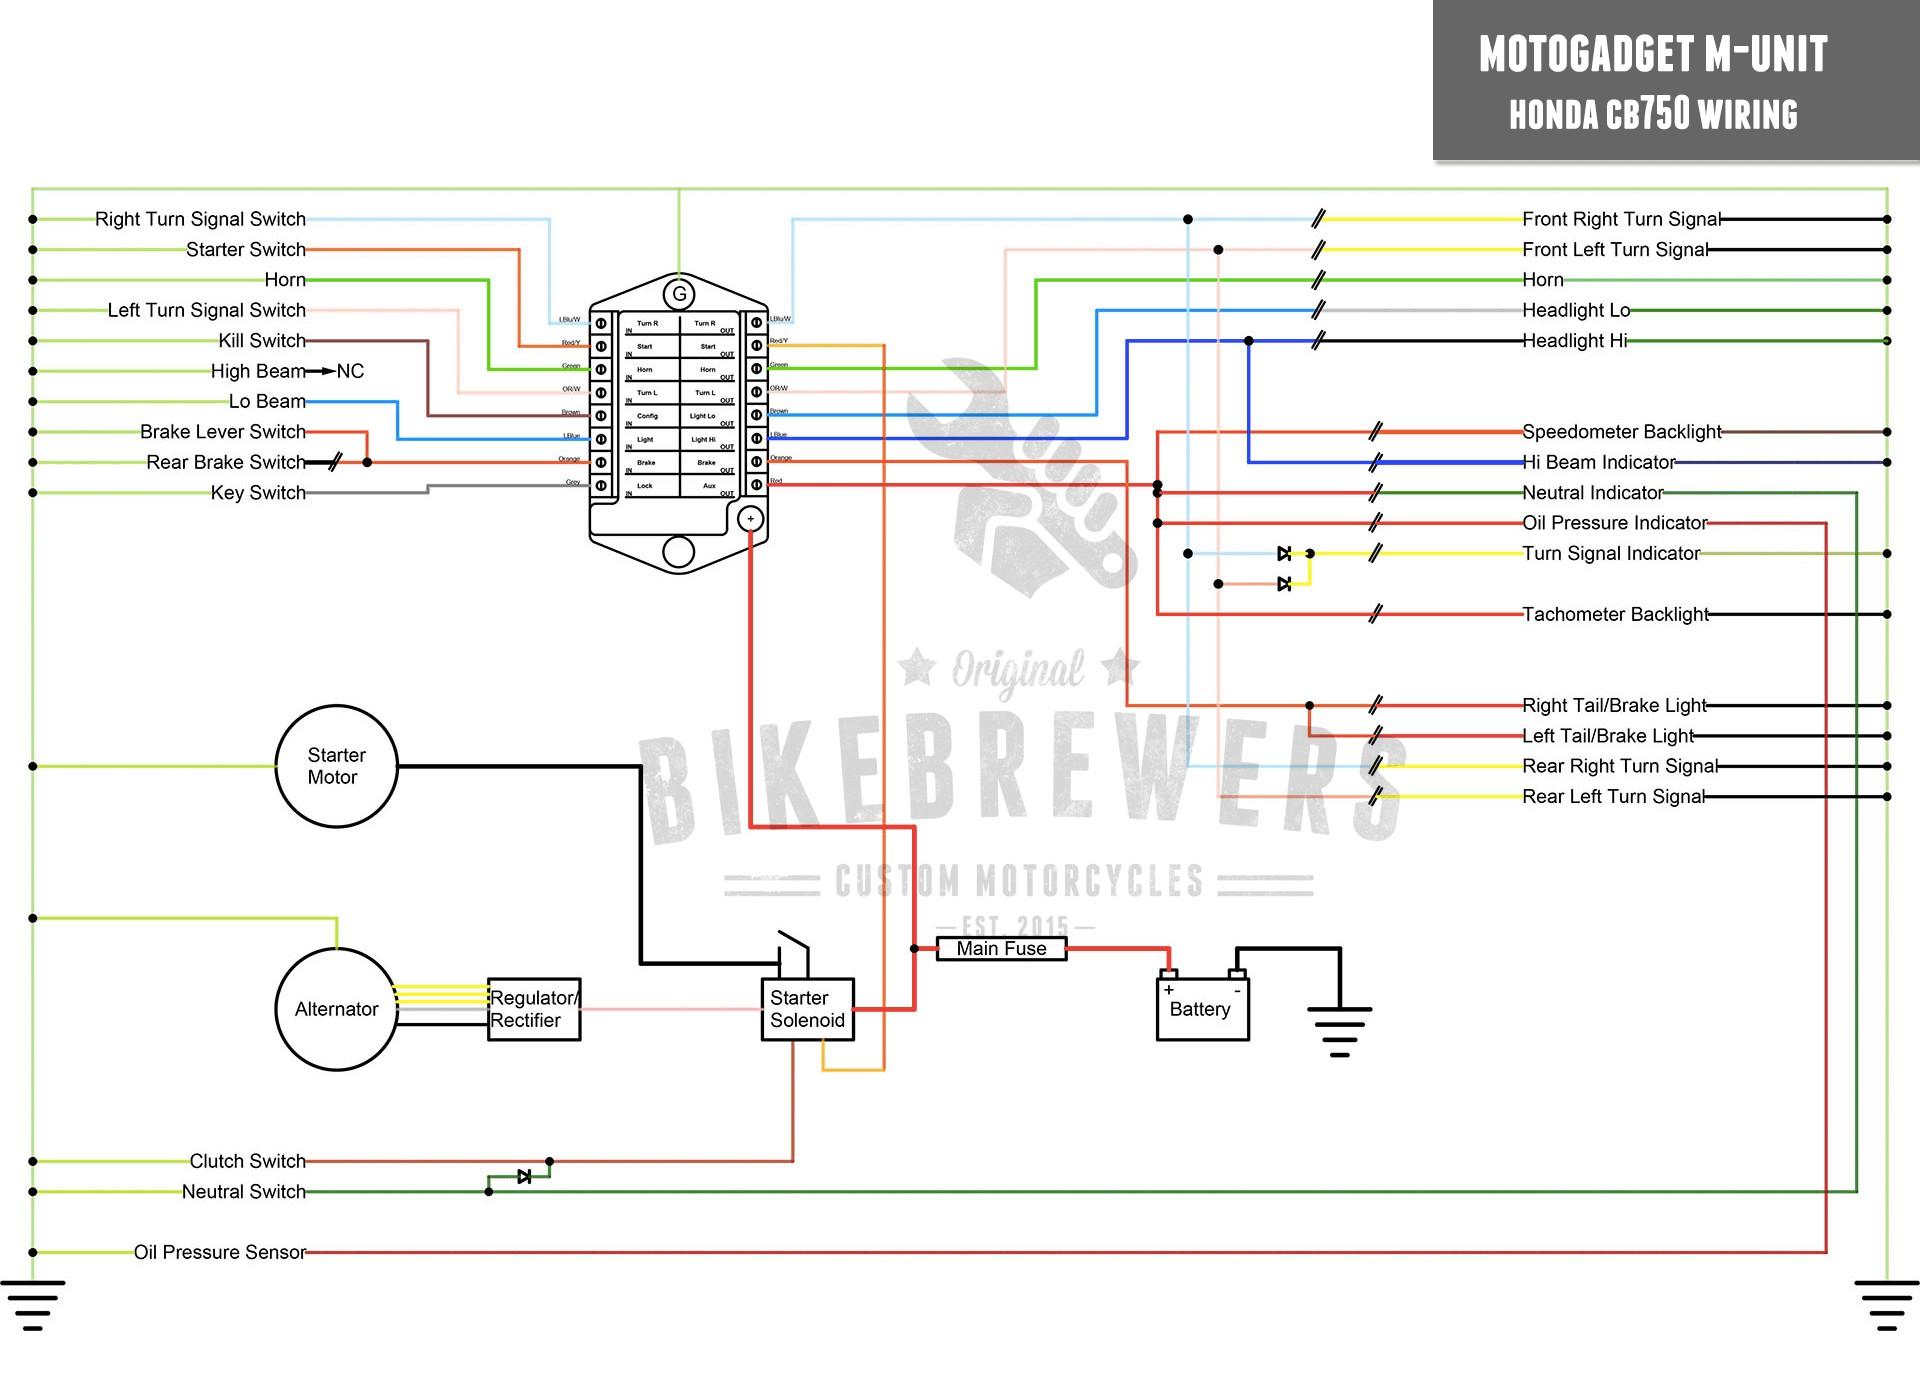 Clutch System Diagram Ke Lever Wiring Diagram Get Free Image About Wiring Diagram Wiring Of Clutch System Diagram